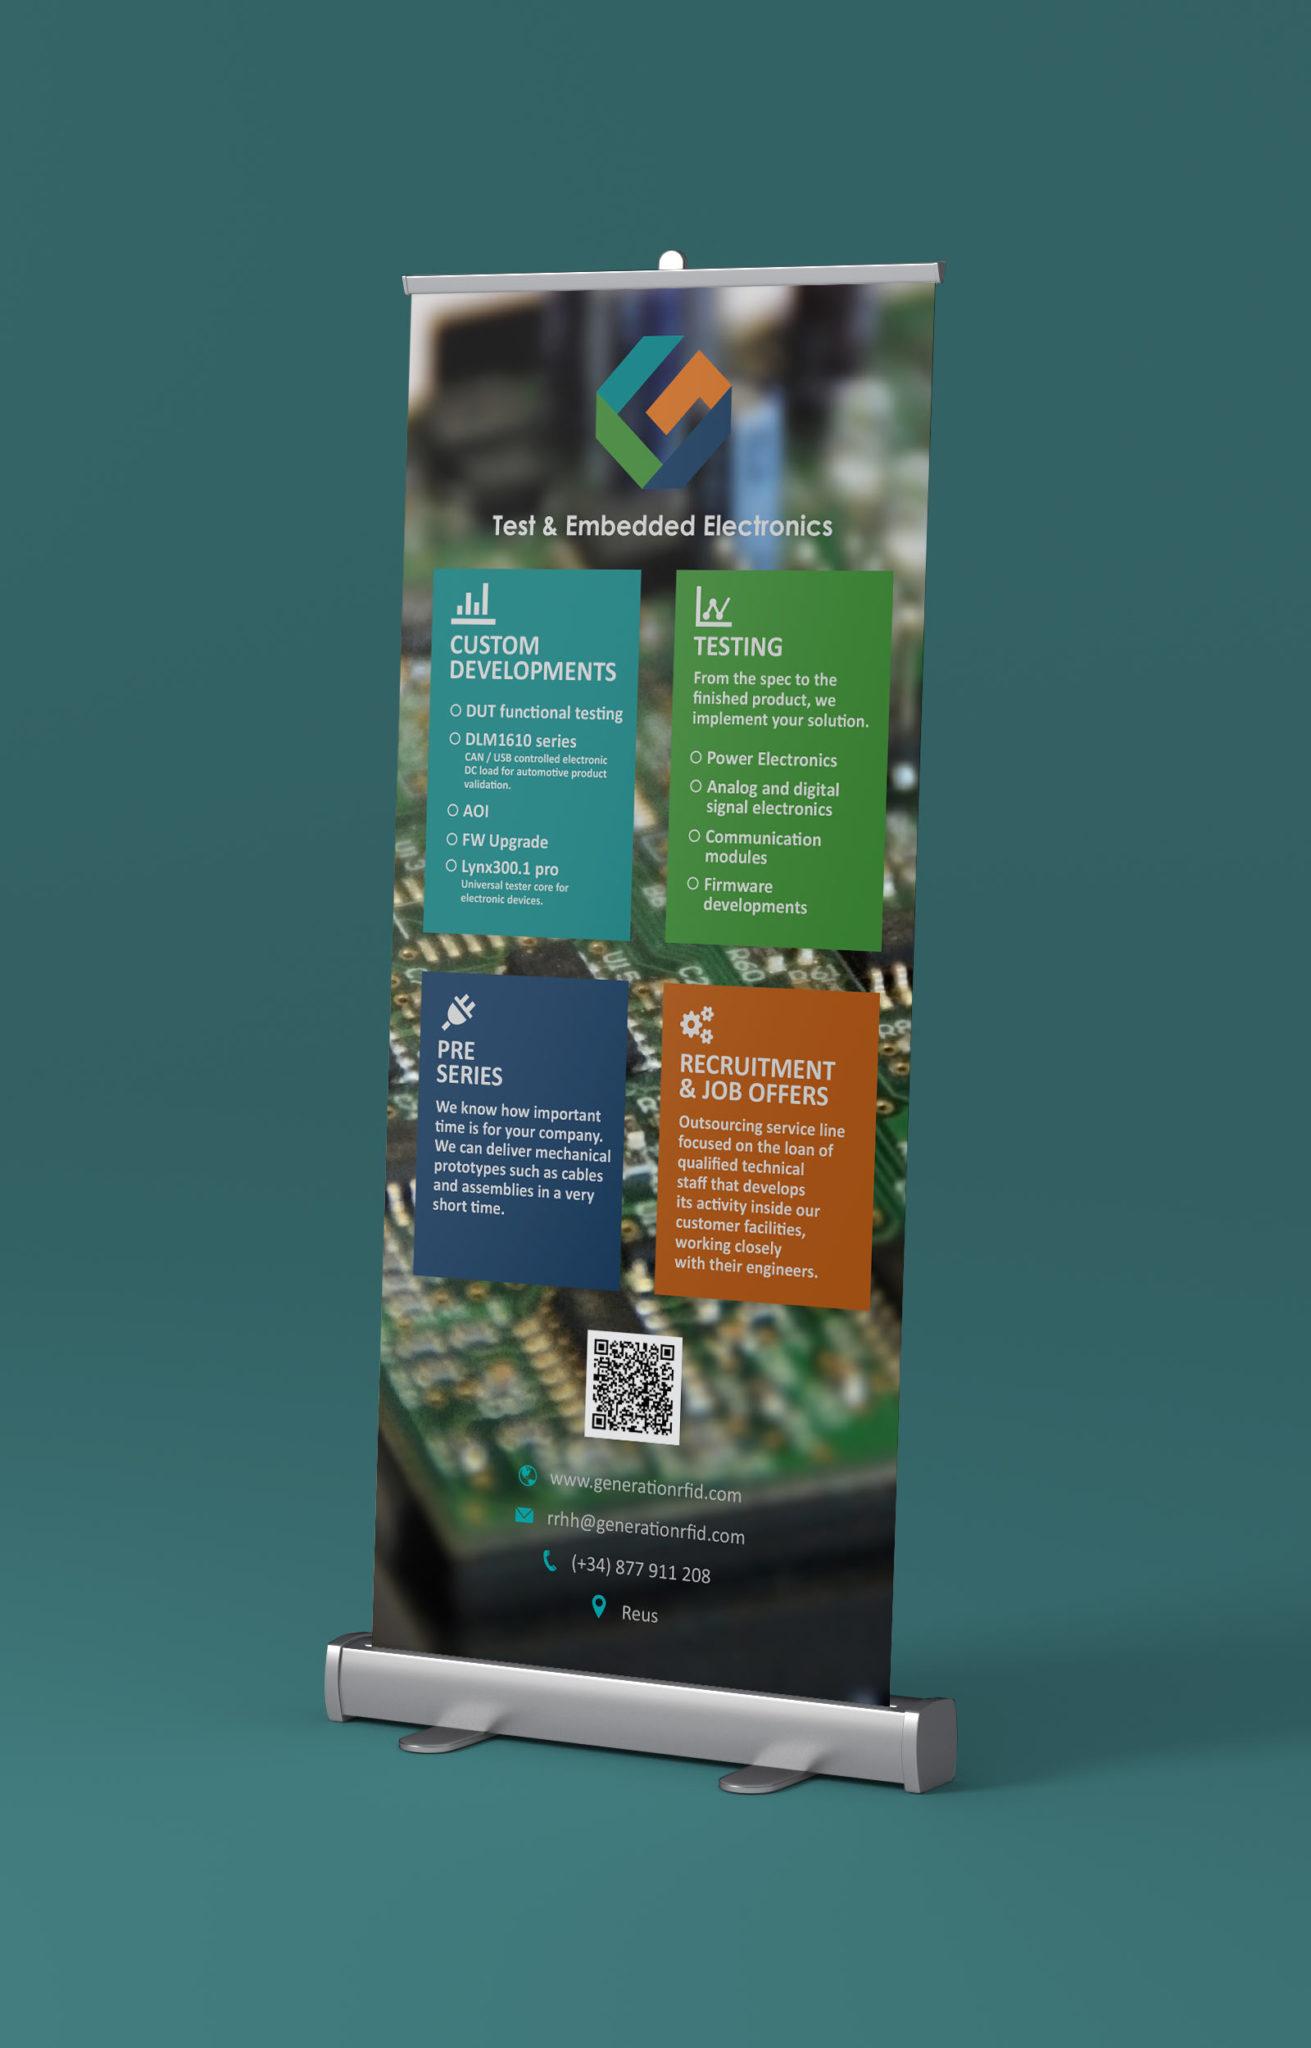 Generation-RFID-RollUp-Lab-Disseny-Grafic-Test-Embedded-Electronics-Angels-Pinyol